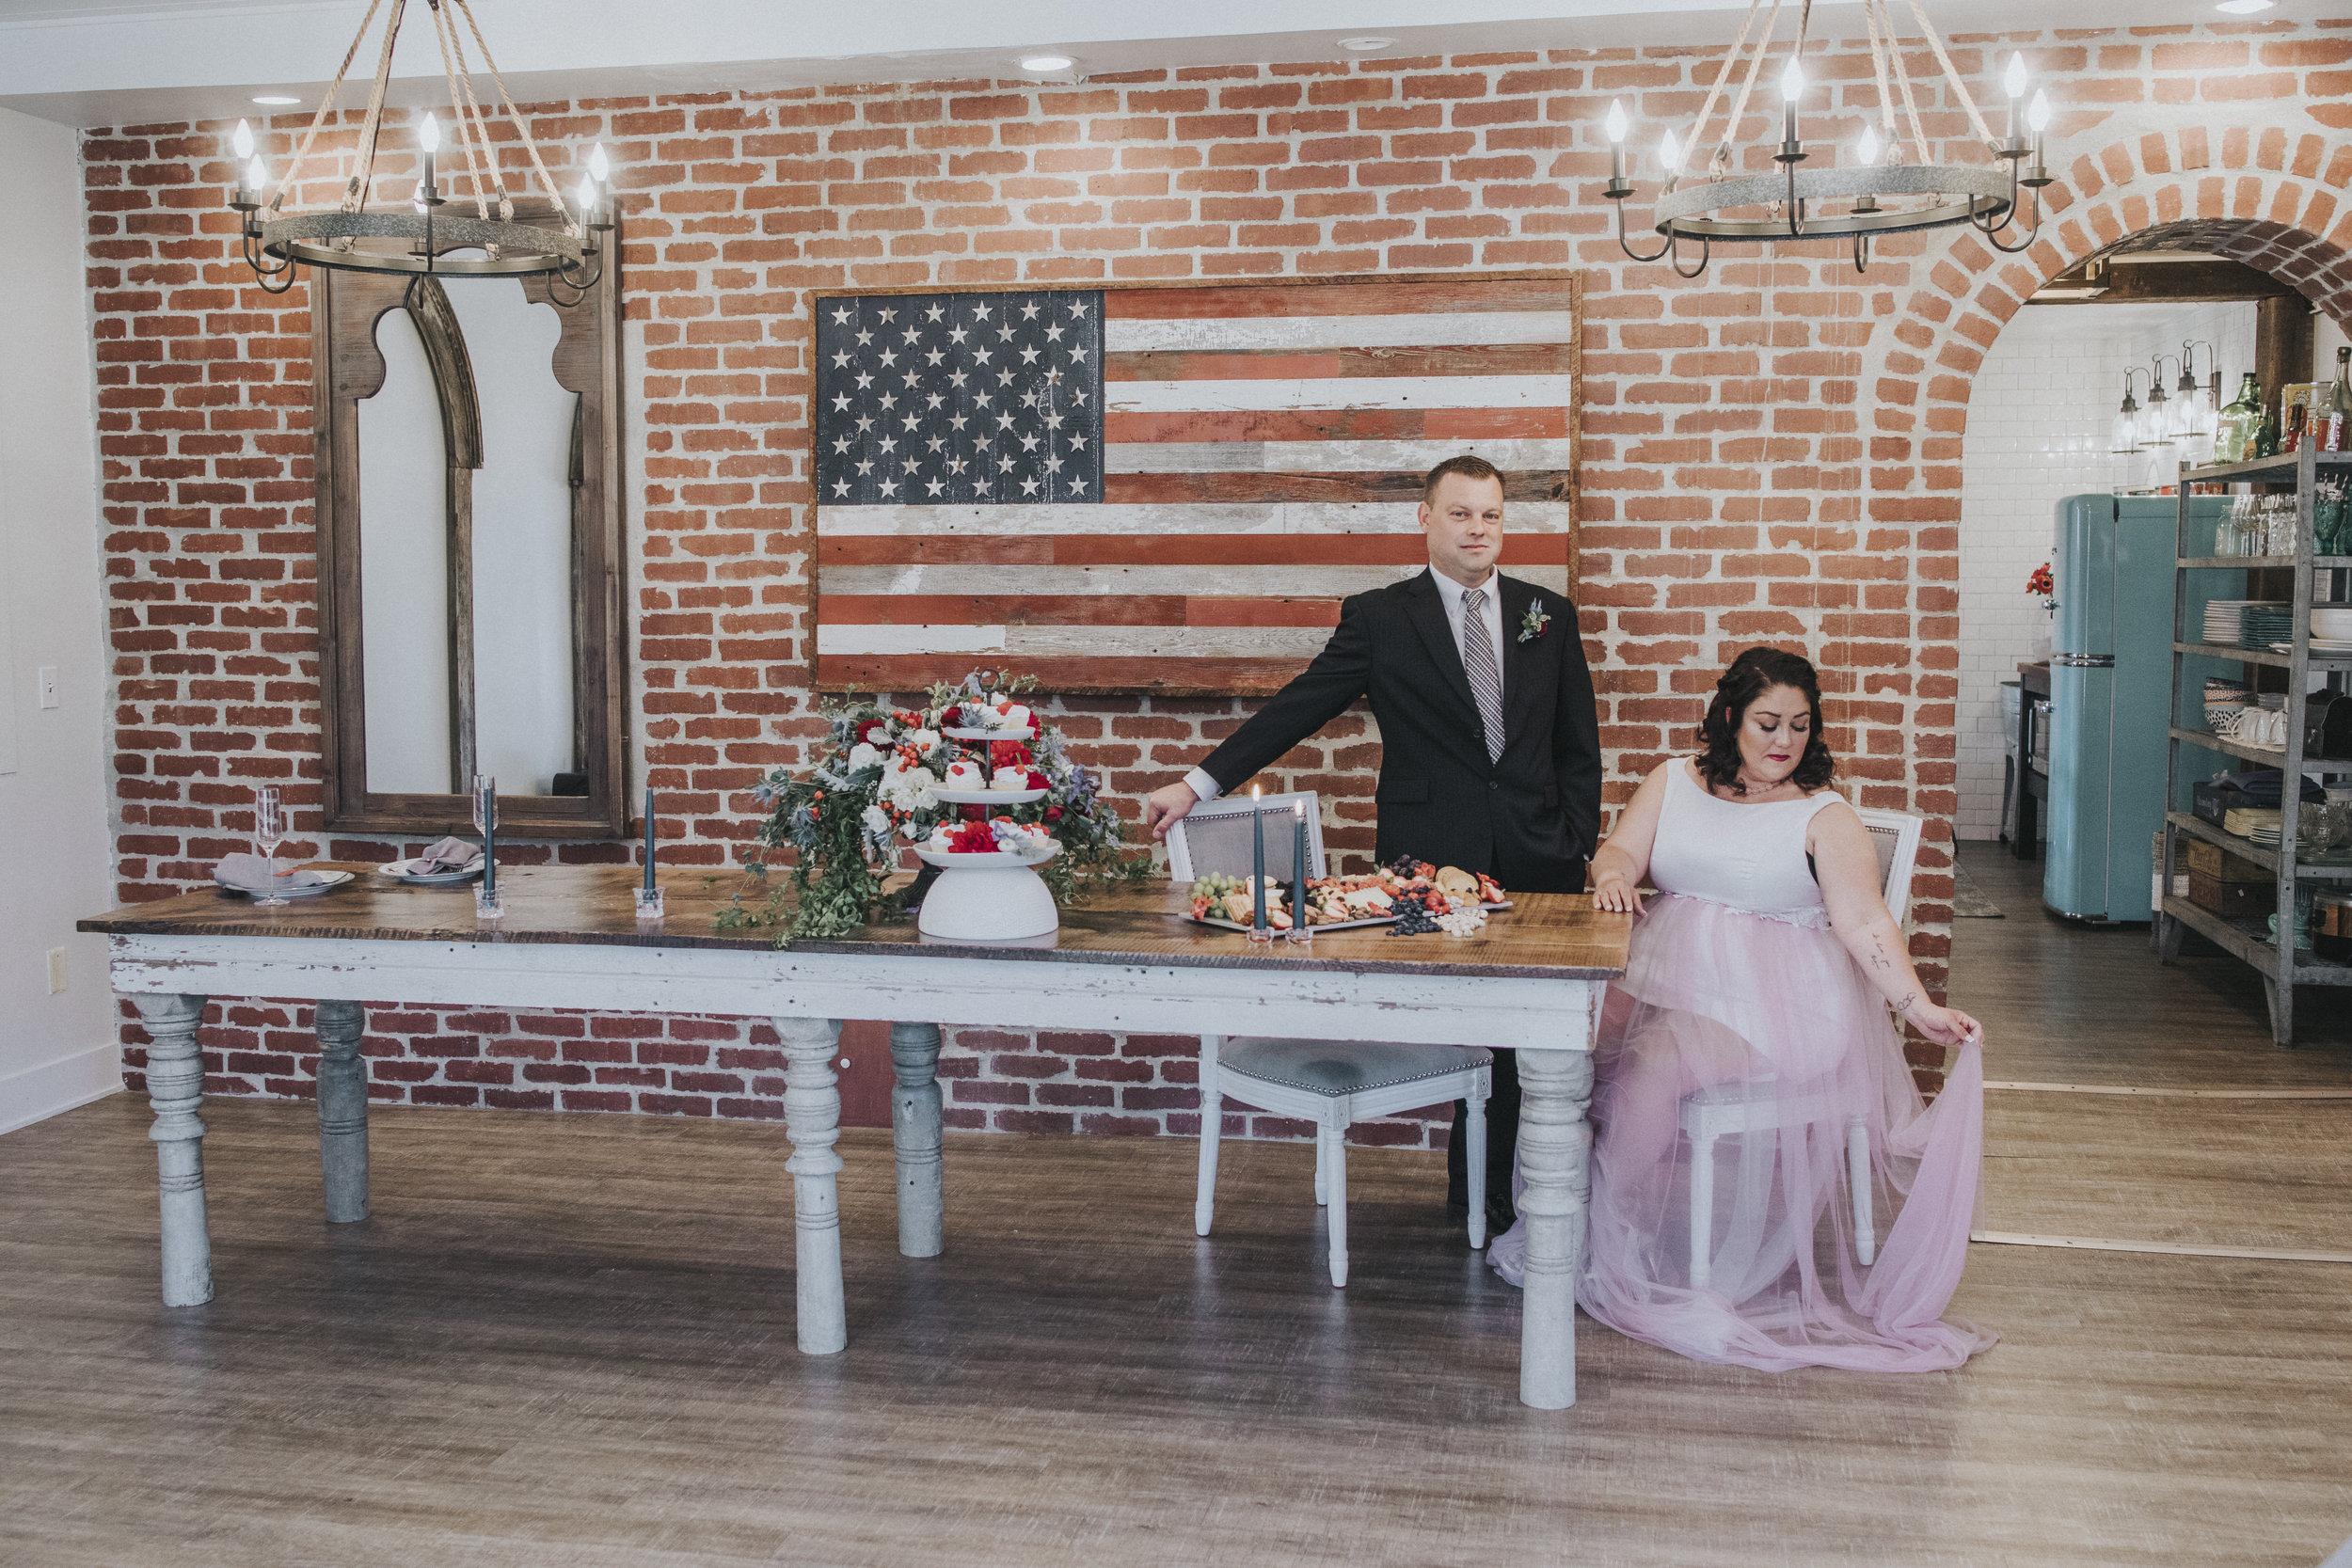 56 midwest-colorado-nebraska-elopement-photography-gretna-turtledoves.jpg